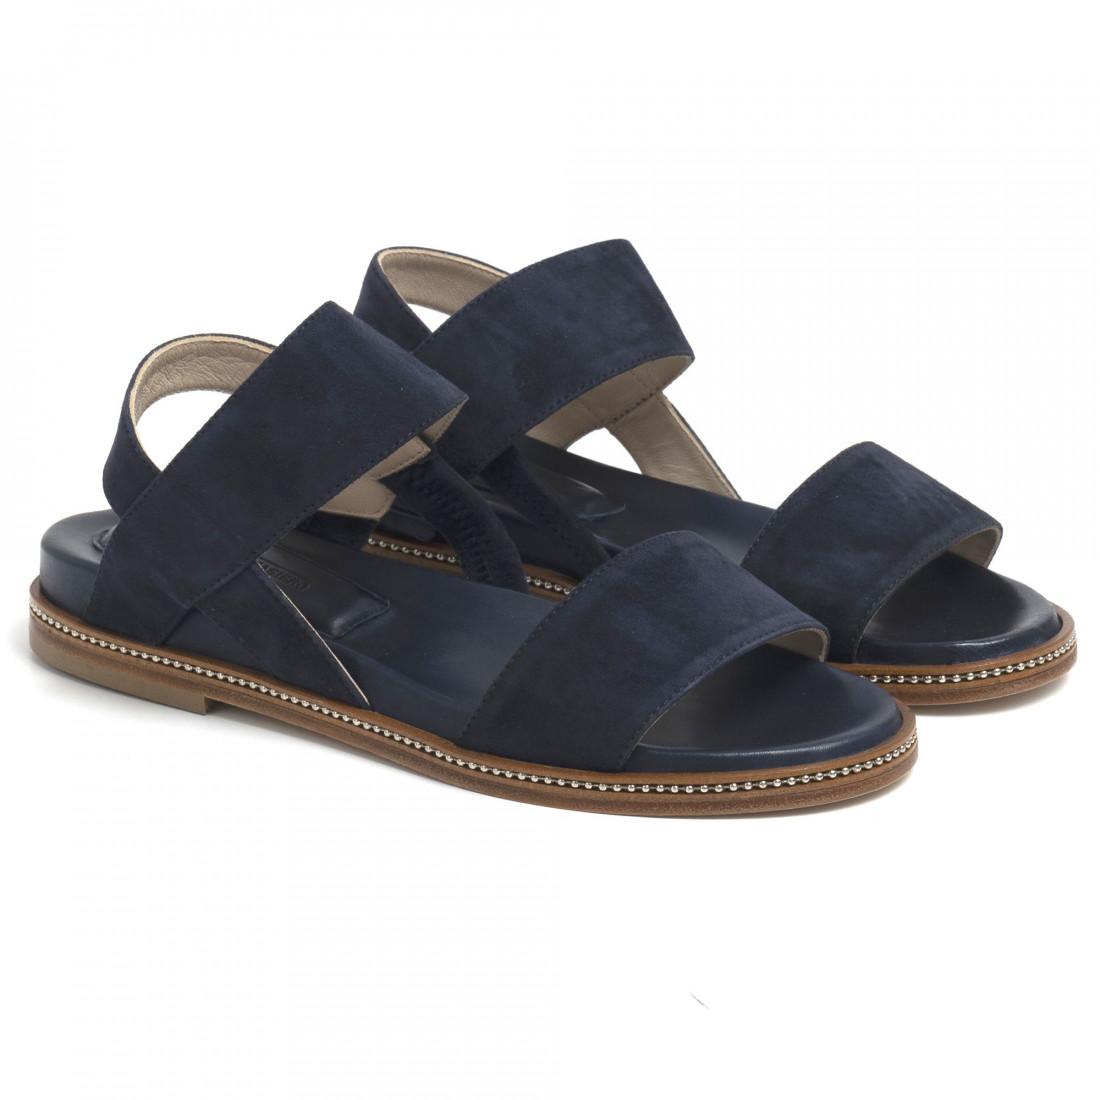 sandals woman lorenzo masiero 210062camoscio abyss 7107